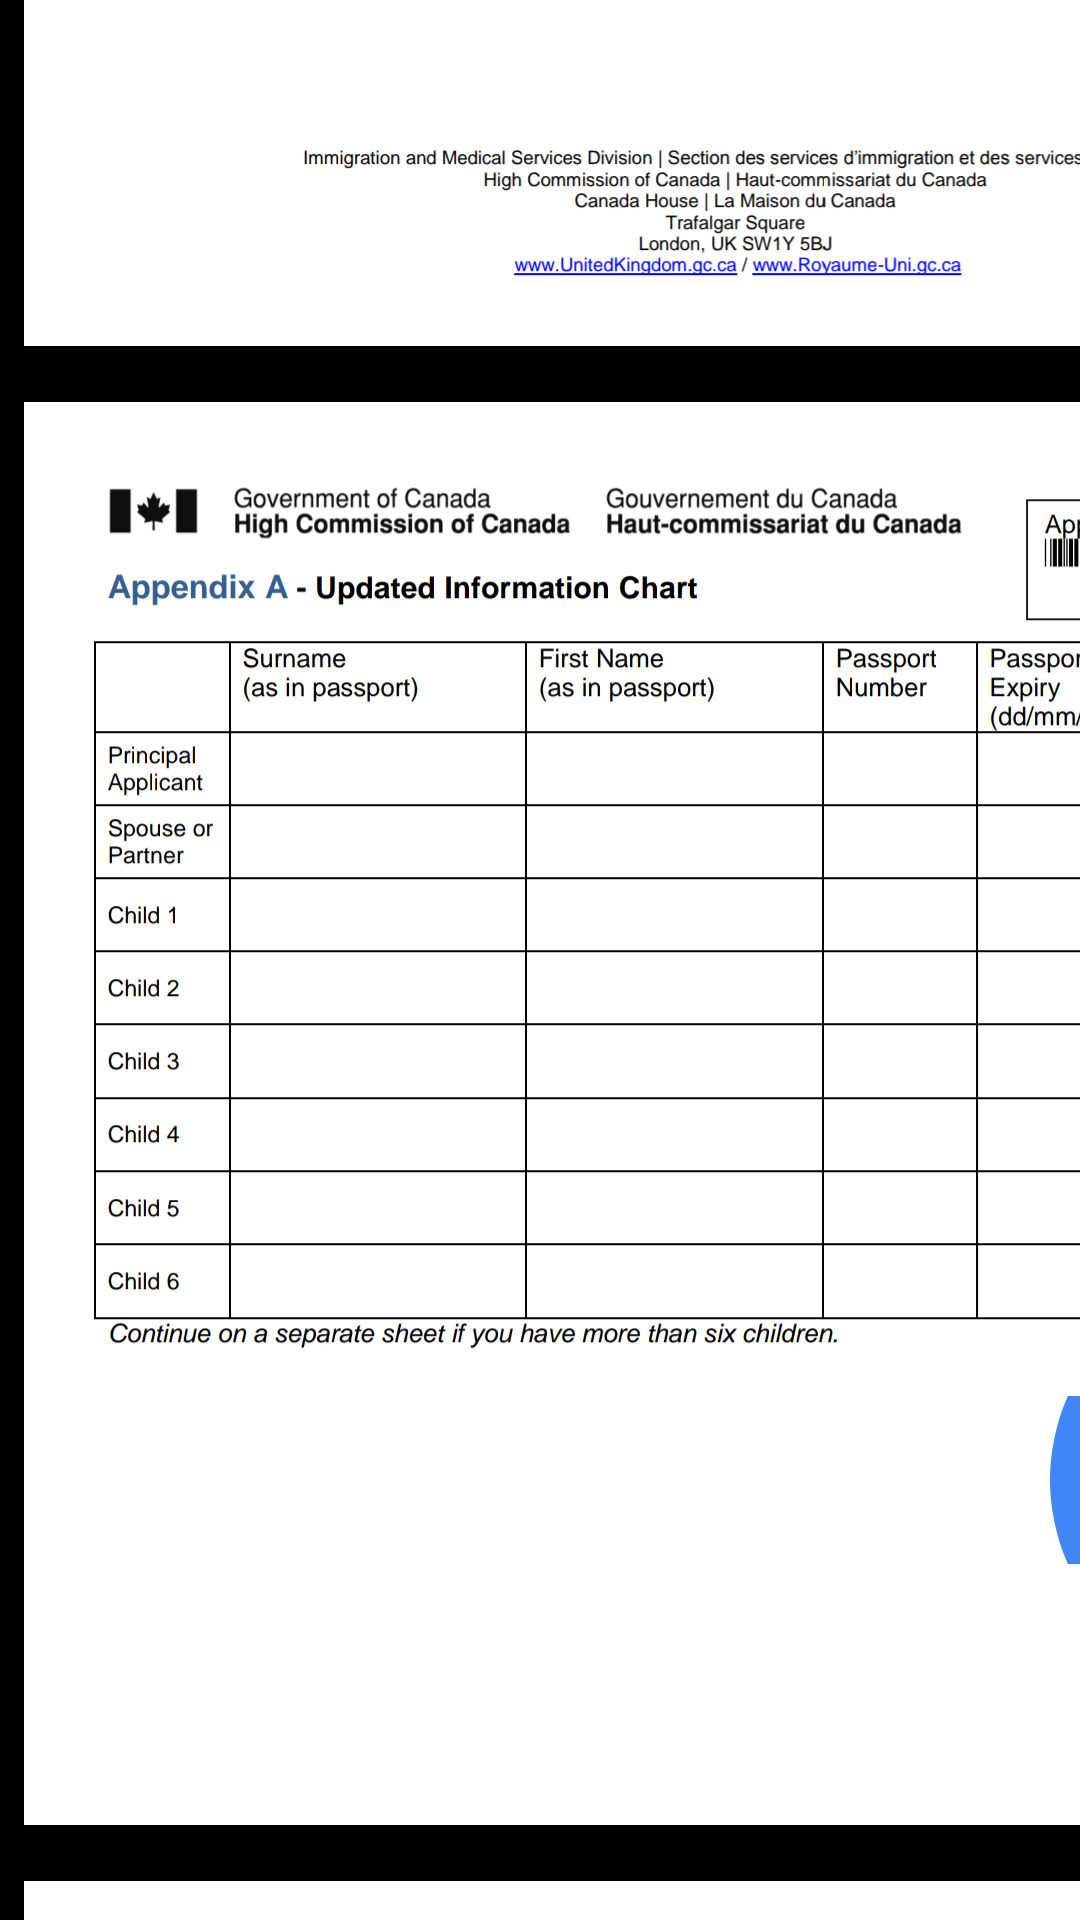 Canadian Citizenship Timeline Spreadsheet 2018 For Timeline For Spousal Sponsorship Via London  Page 1030  British Expats